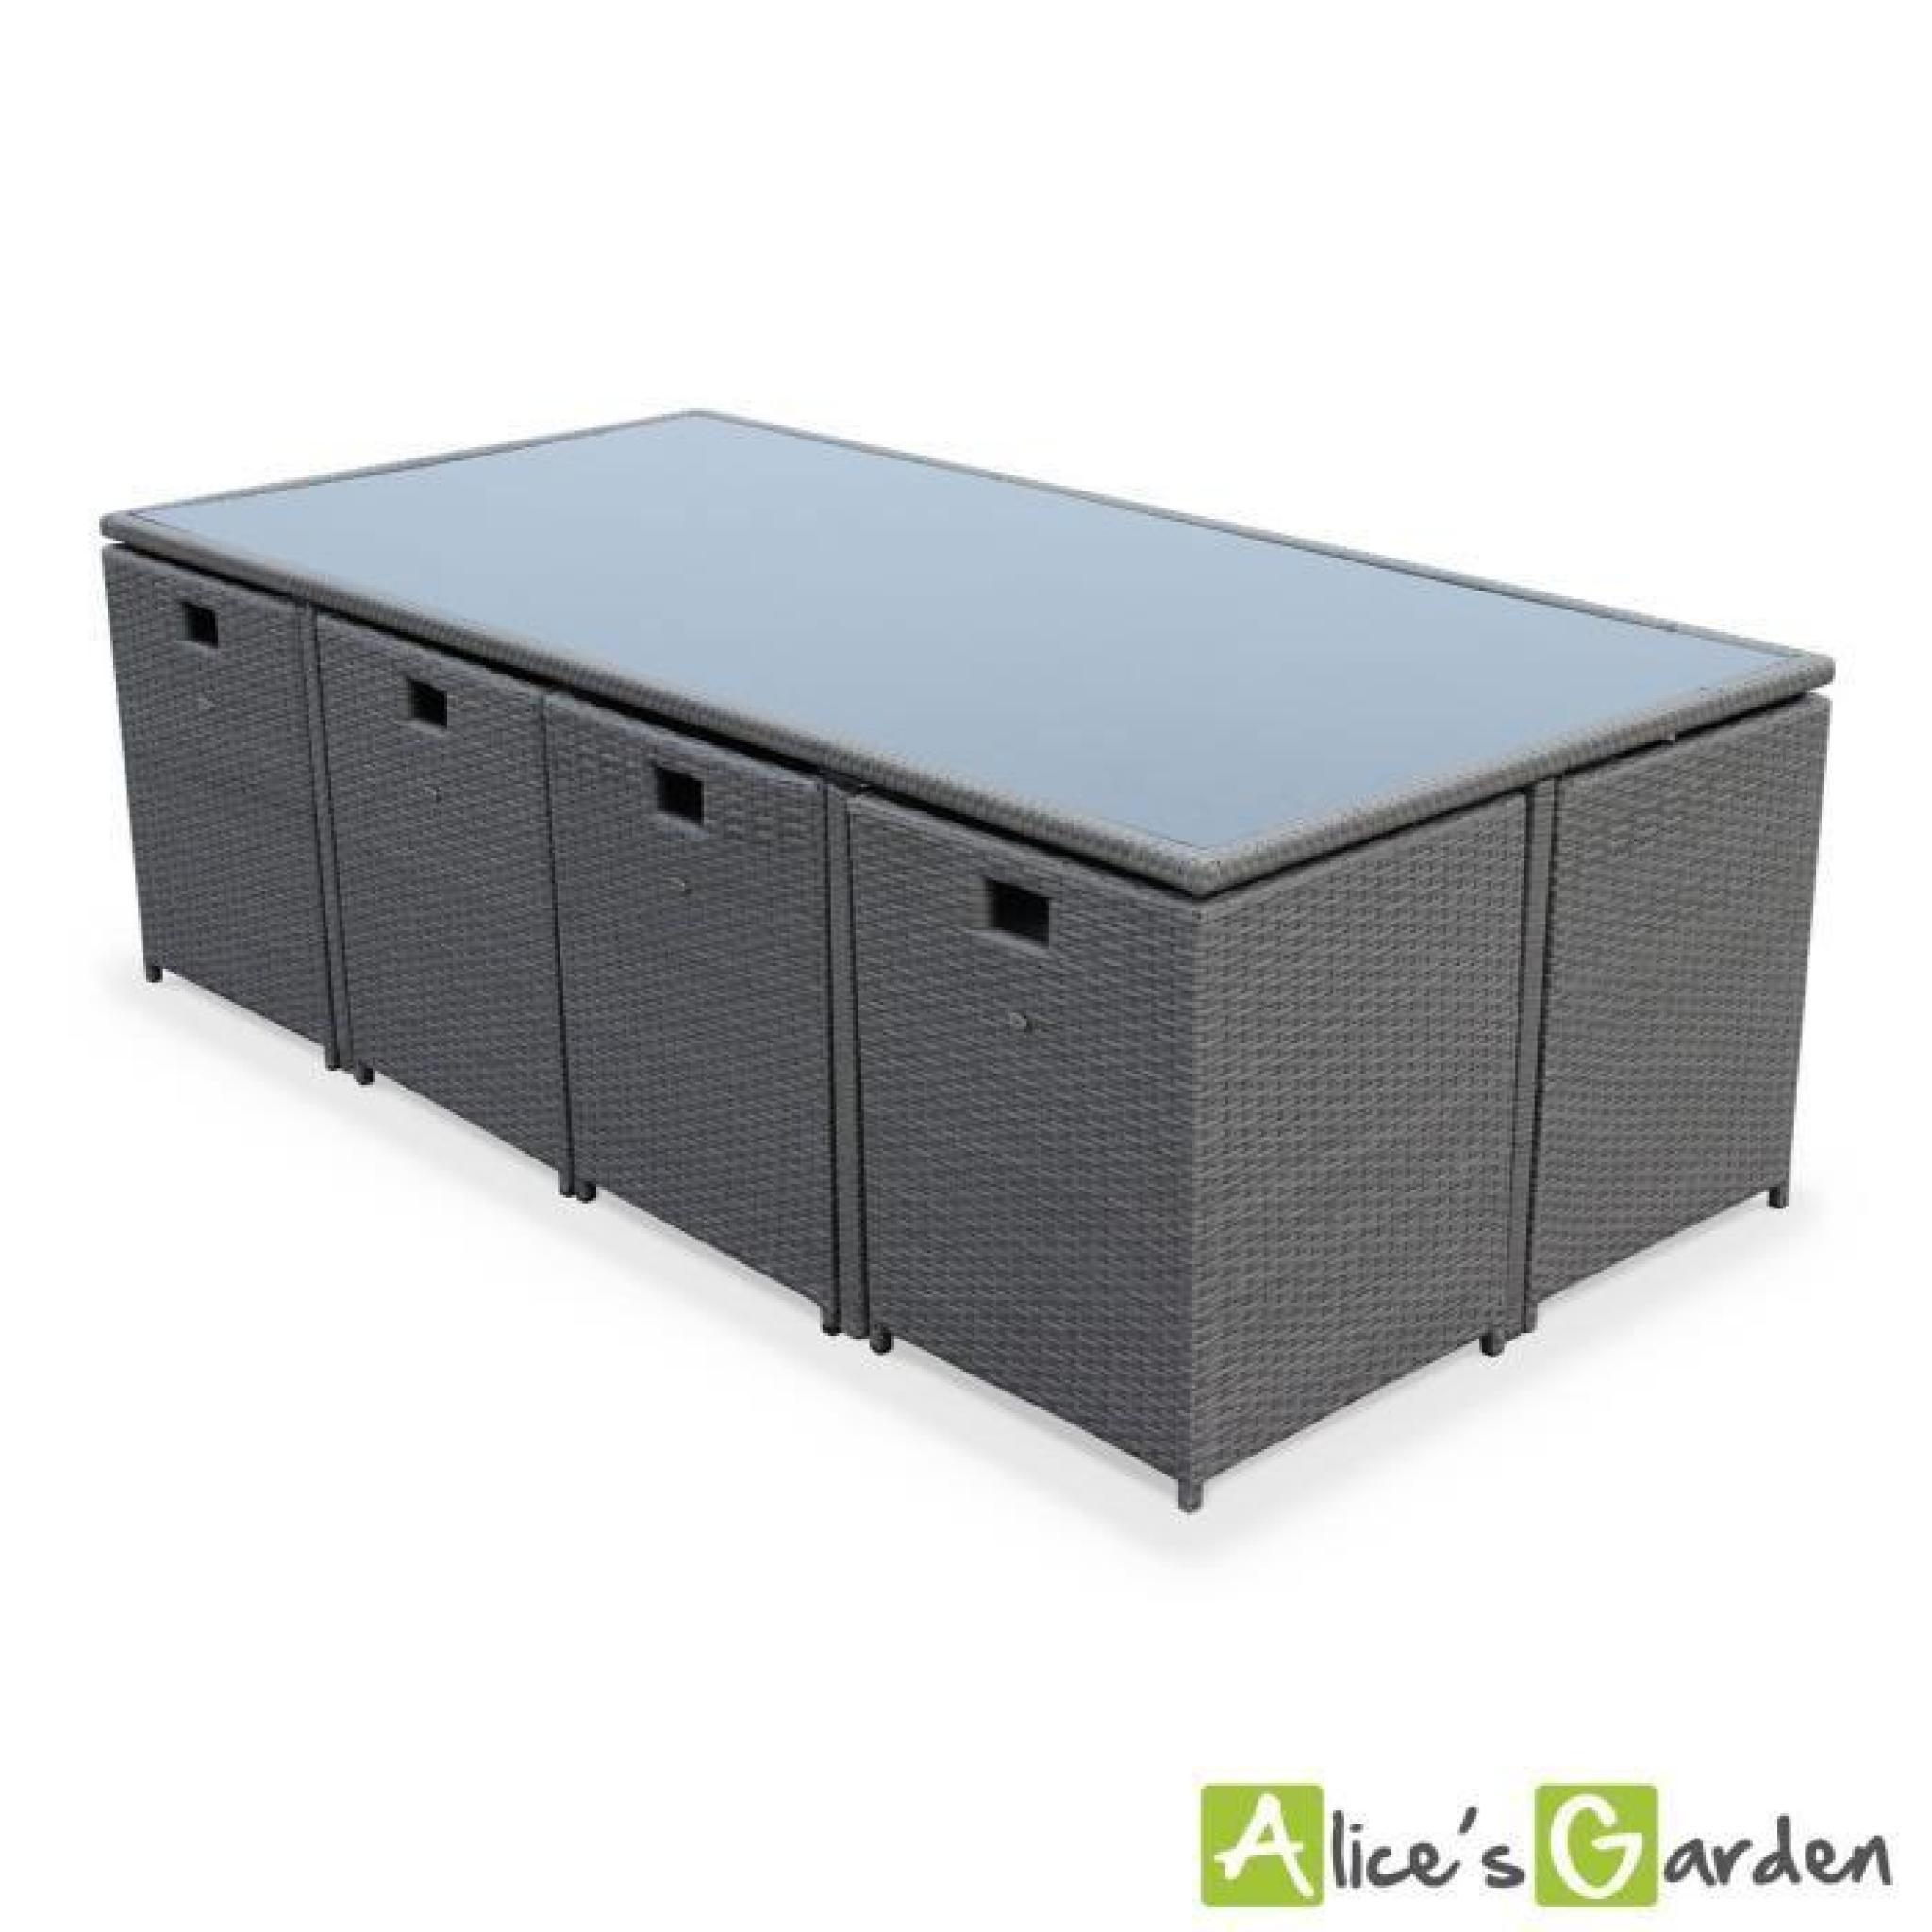 salon de jardin vasto achat vente salon de jardin en resine tressee pas cher. Black Bedroom Furniture Sets. Home Design Ideas